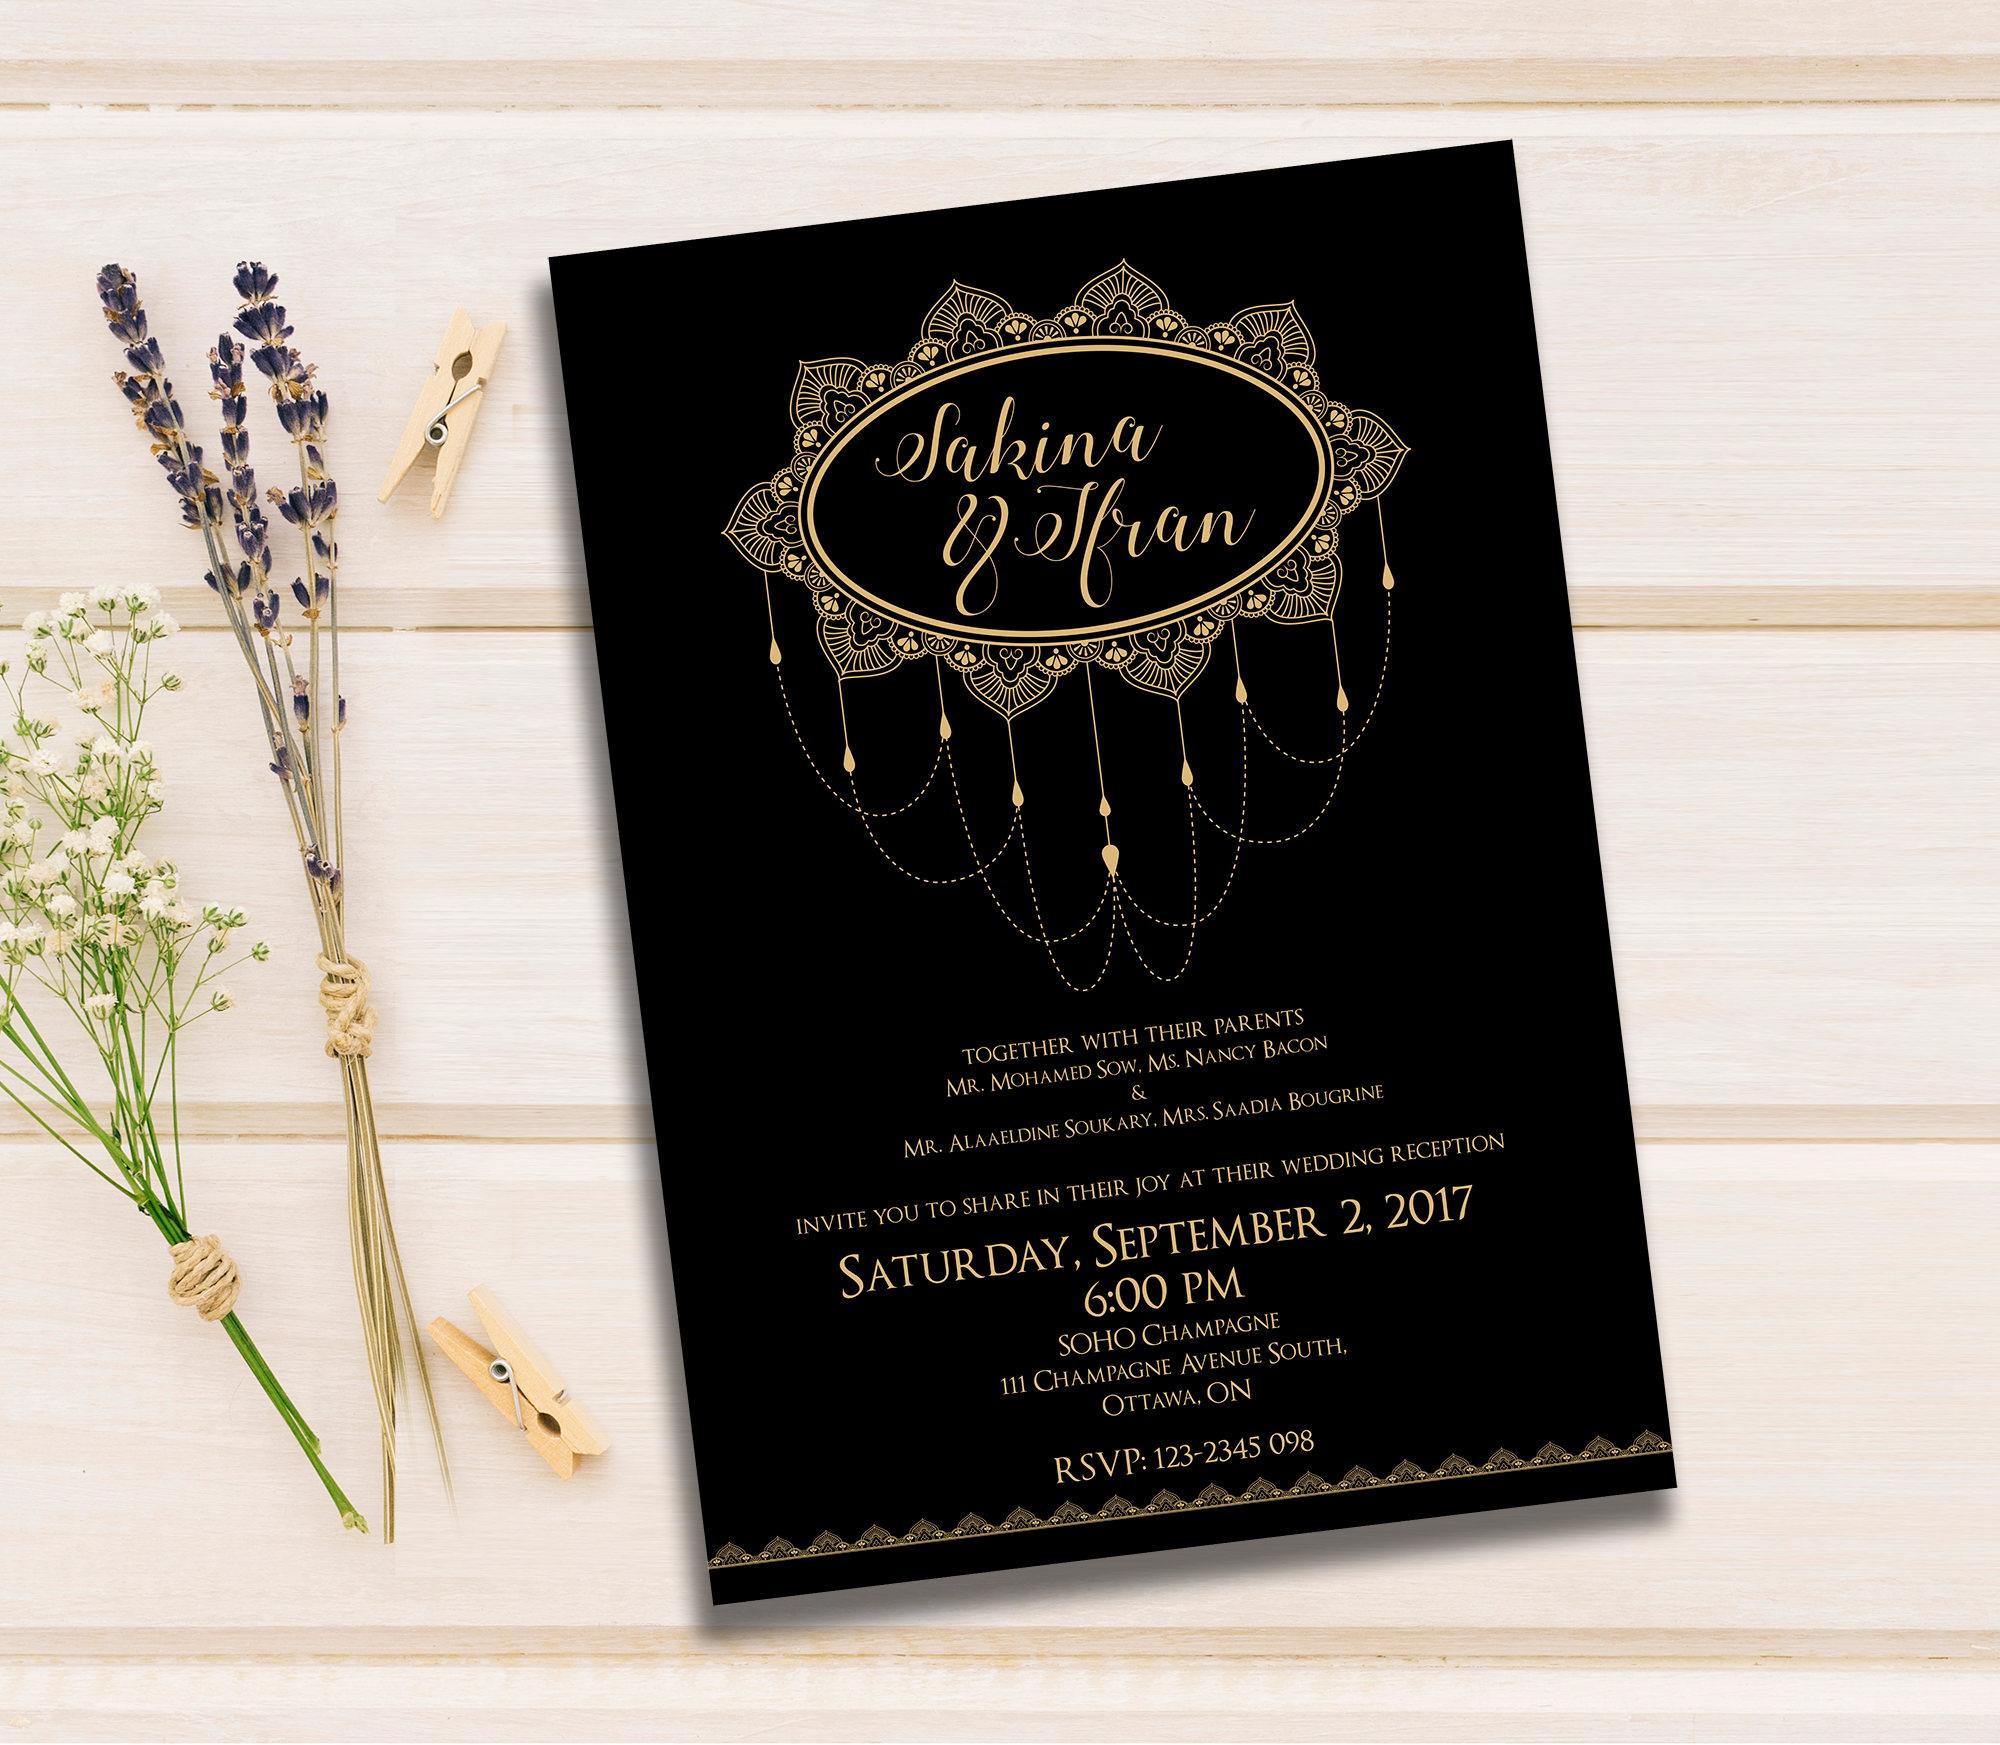 Wedding Invitations Custom Invitation Wedding invitation